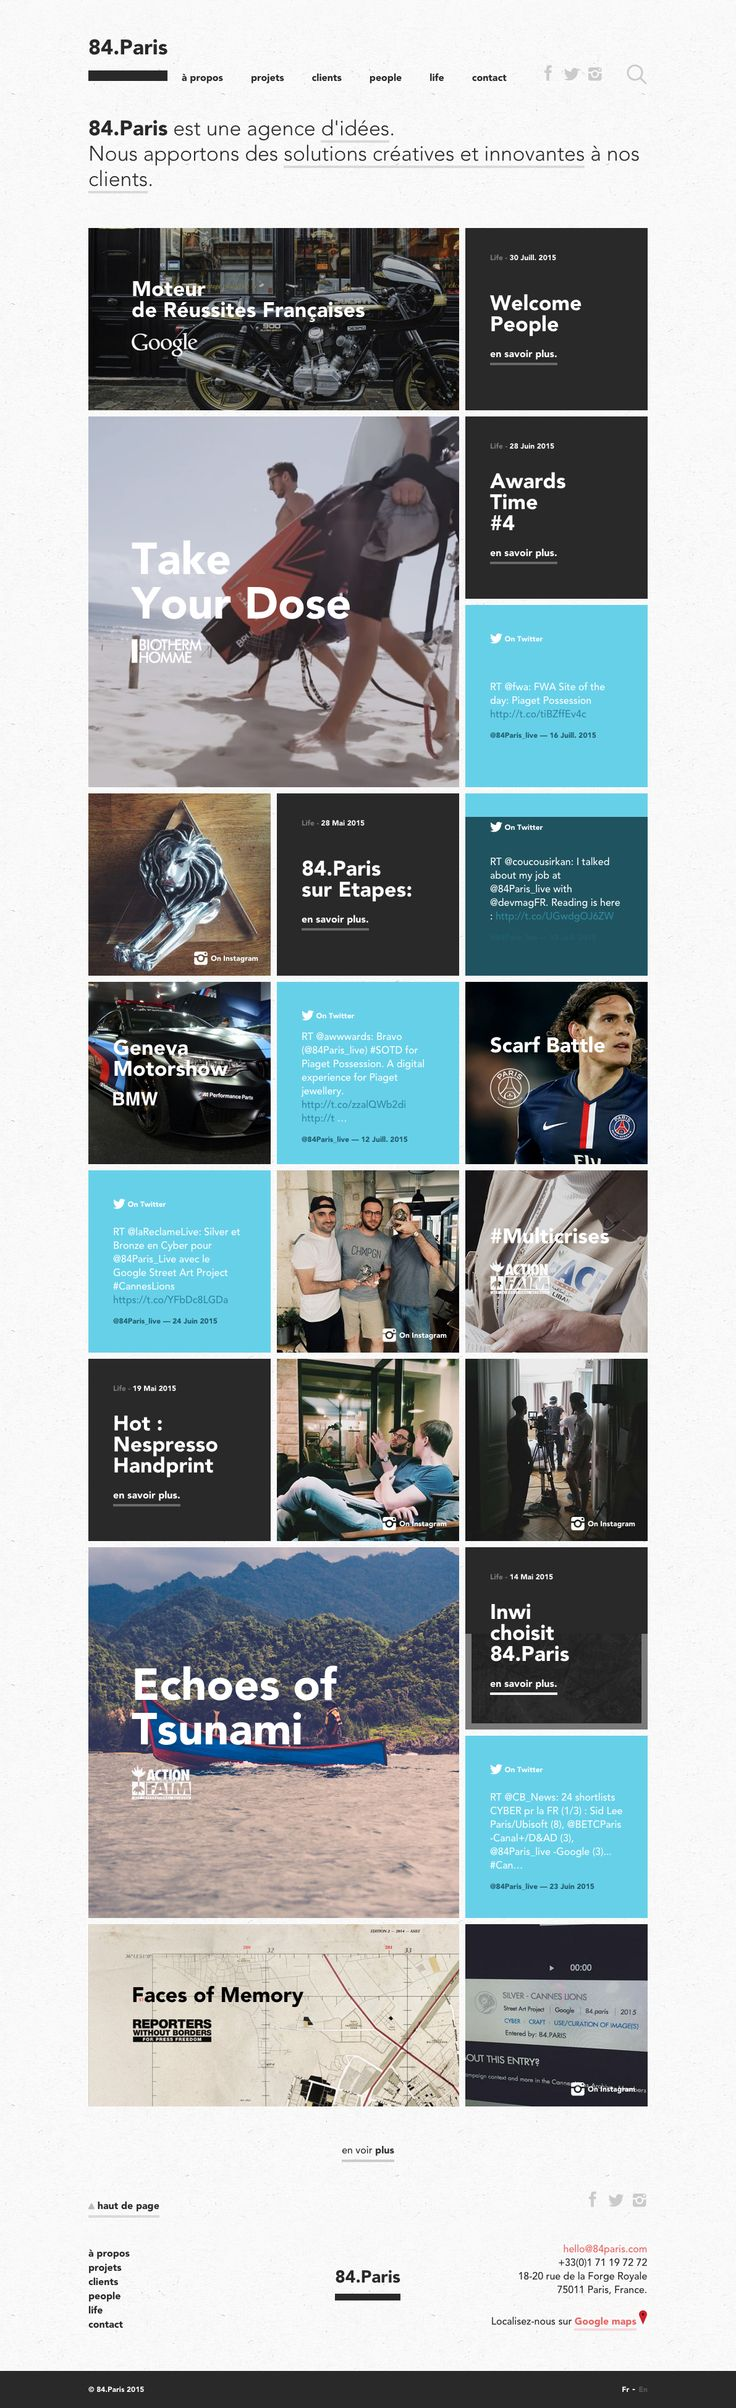 84.Paris by http://www.jcsuzanne.com/